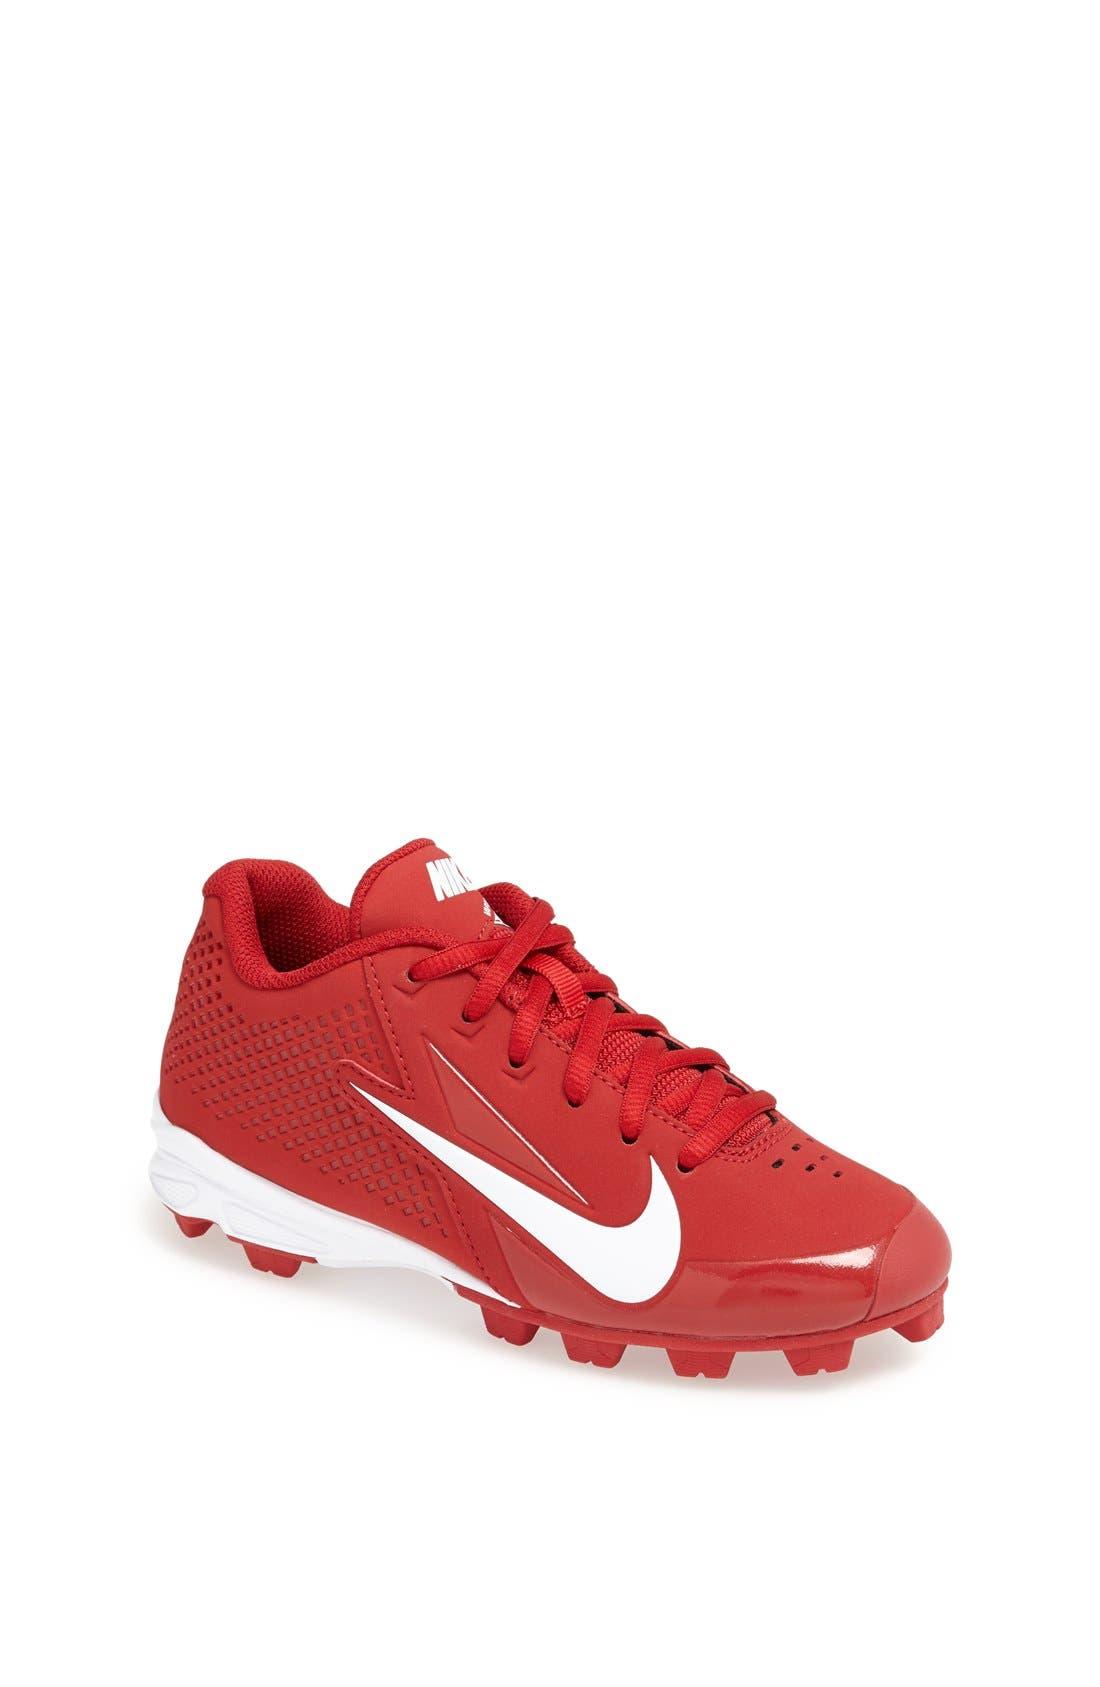 Main Image - Nike 'Vapor Keystone Low' Baseball Cleat  (Little Kid & Big Kid)